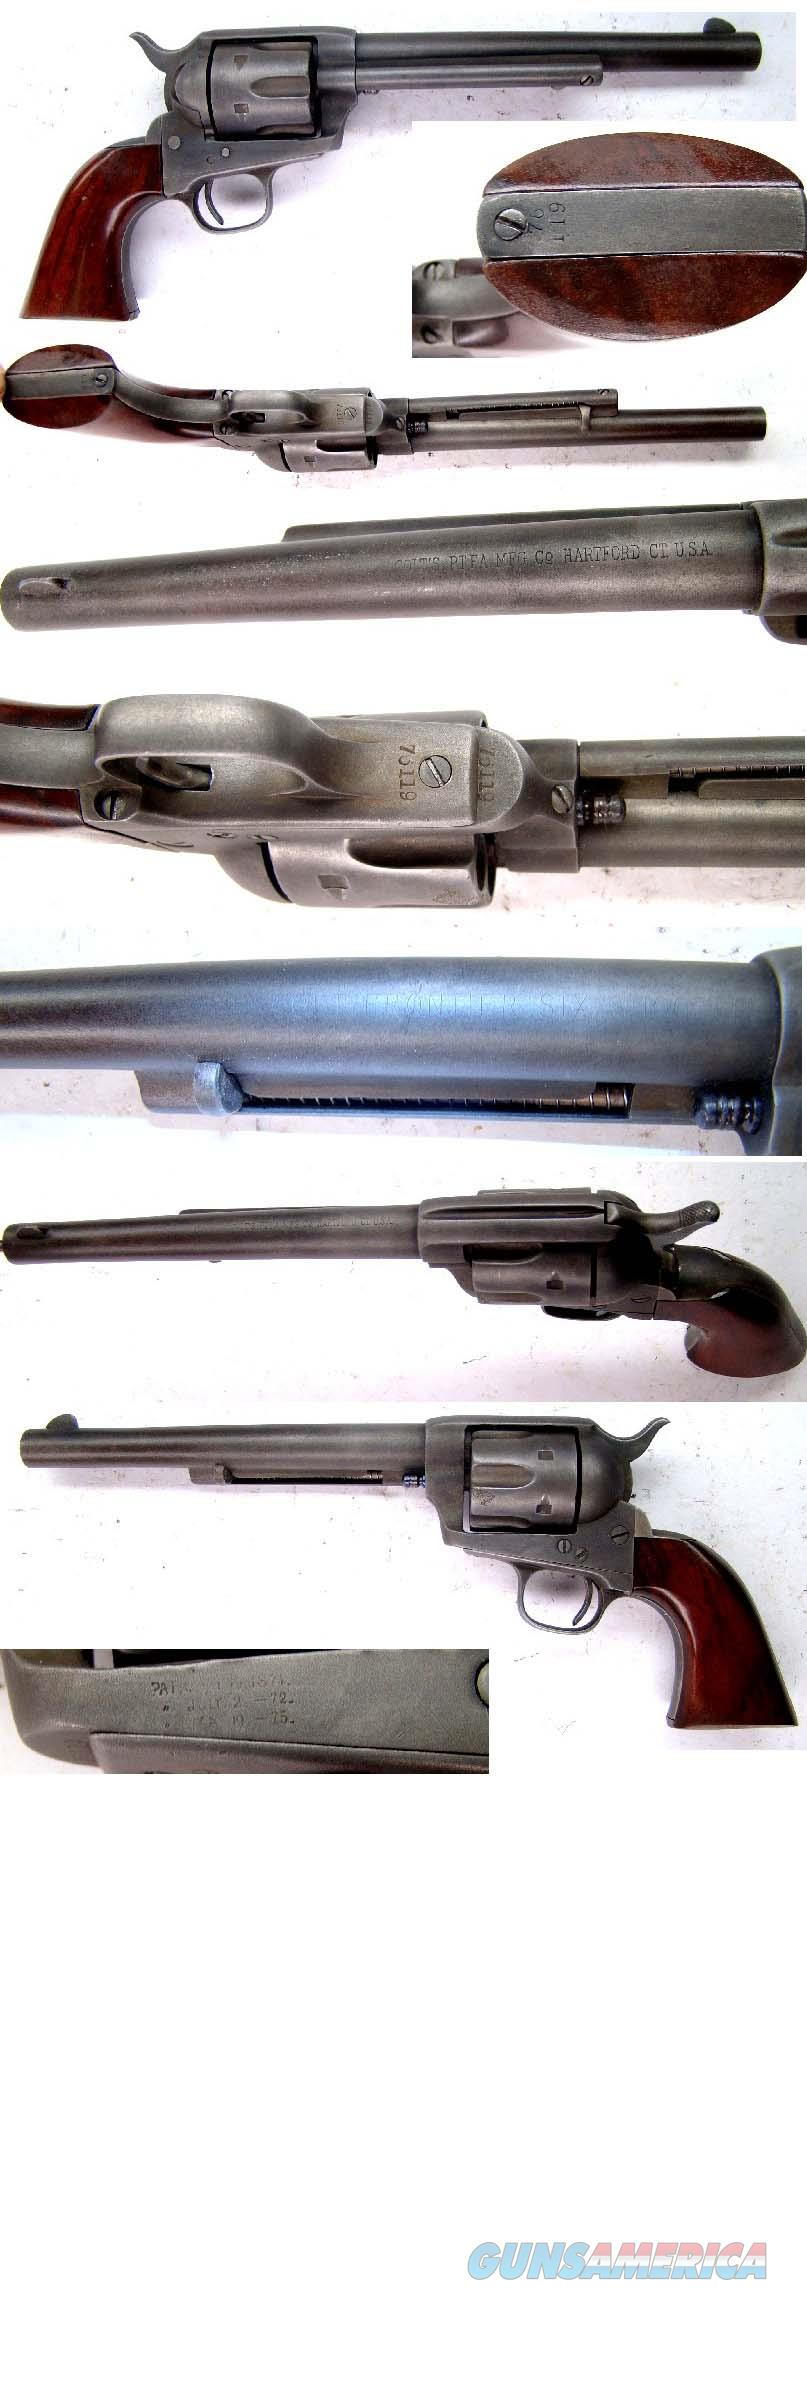 Colt SAA  44-40  Guns > Pistols > Colt Single Action Revolvers - 1st Gen.